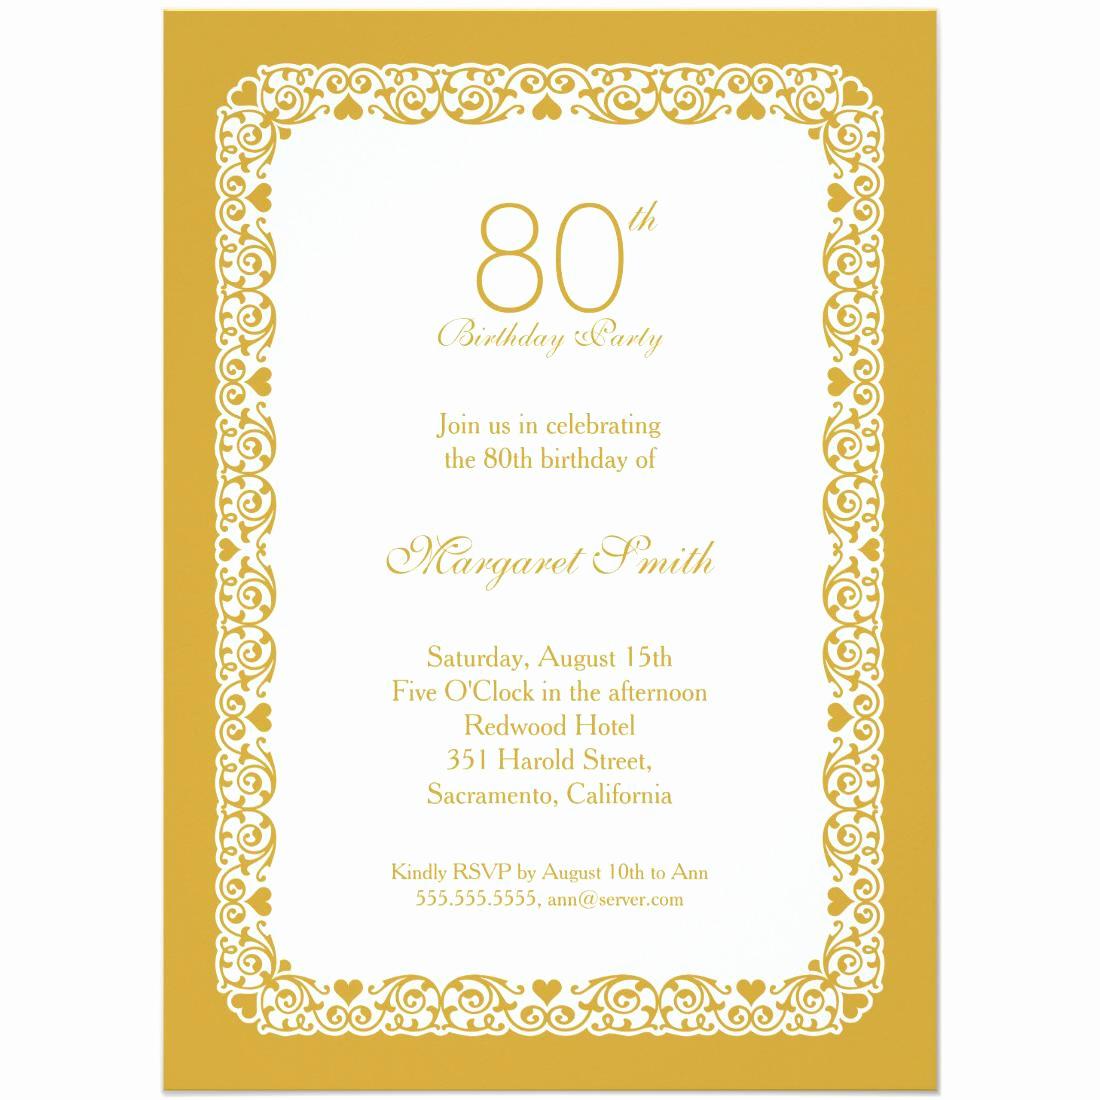 Free Anniversary Invitation Templates Elegant 15 Sample 80th Birthday Invitations Templates Ideas